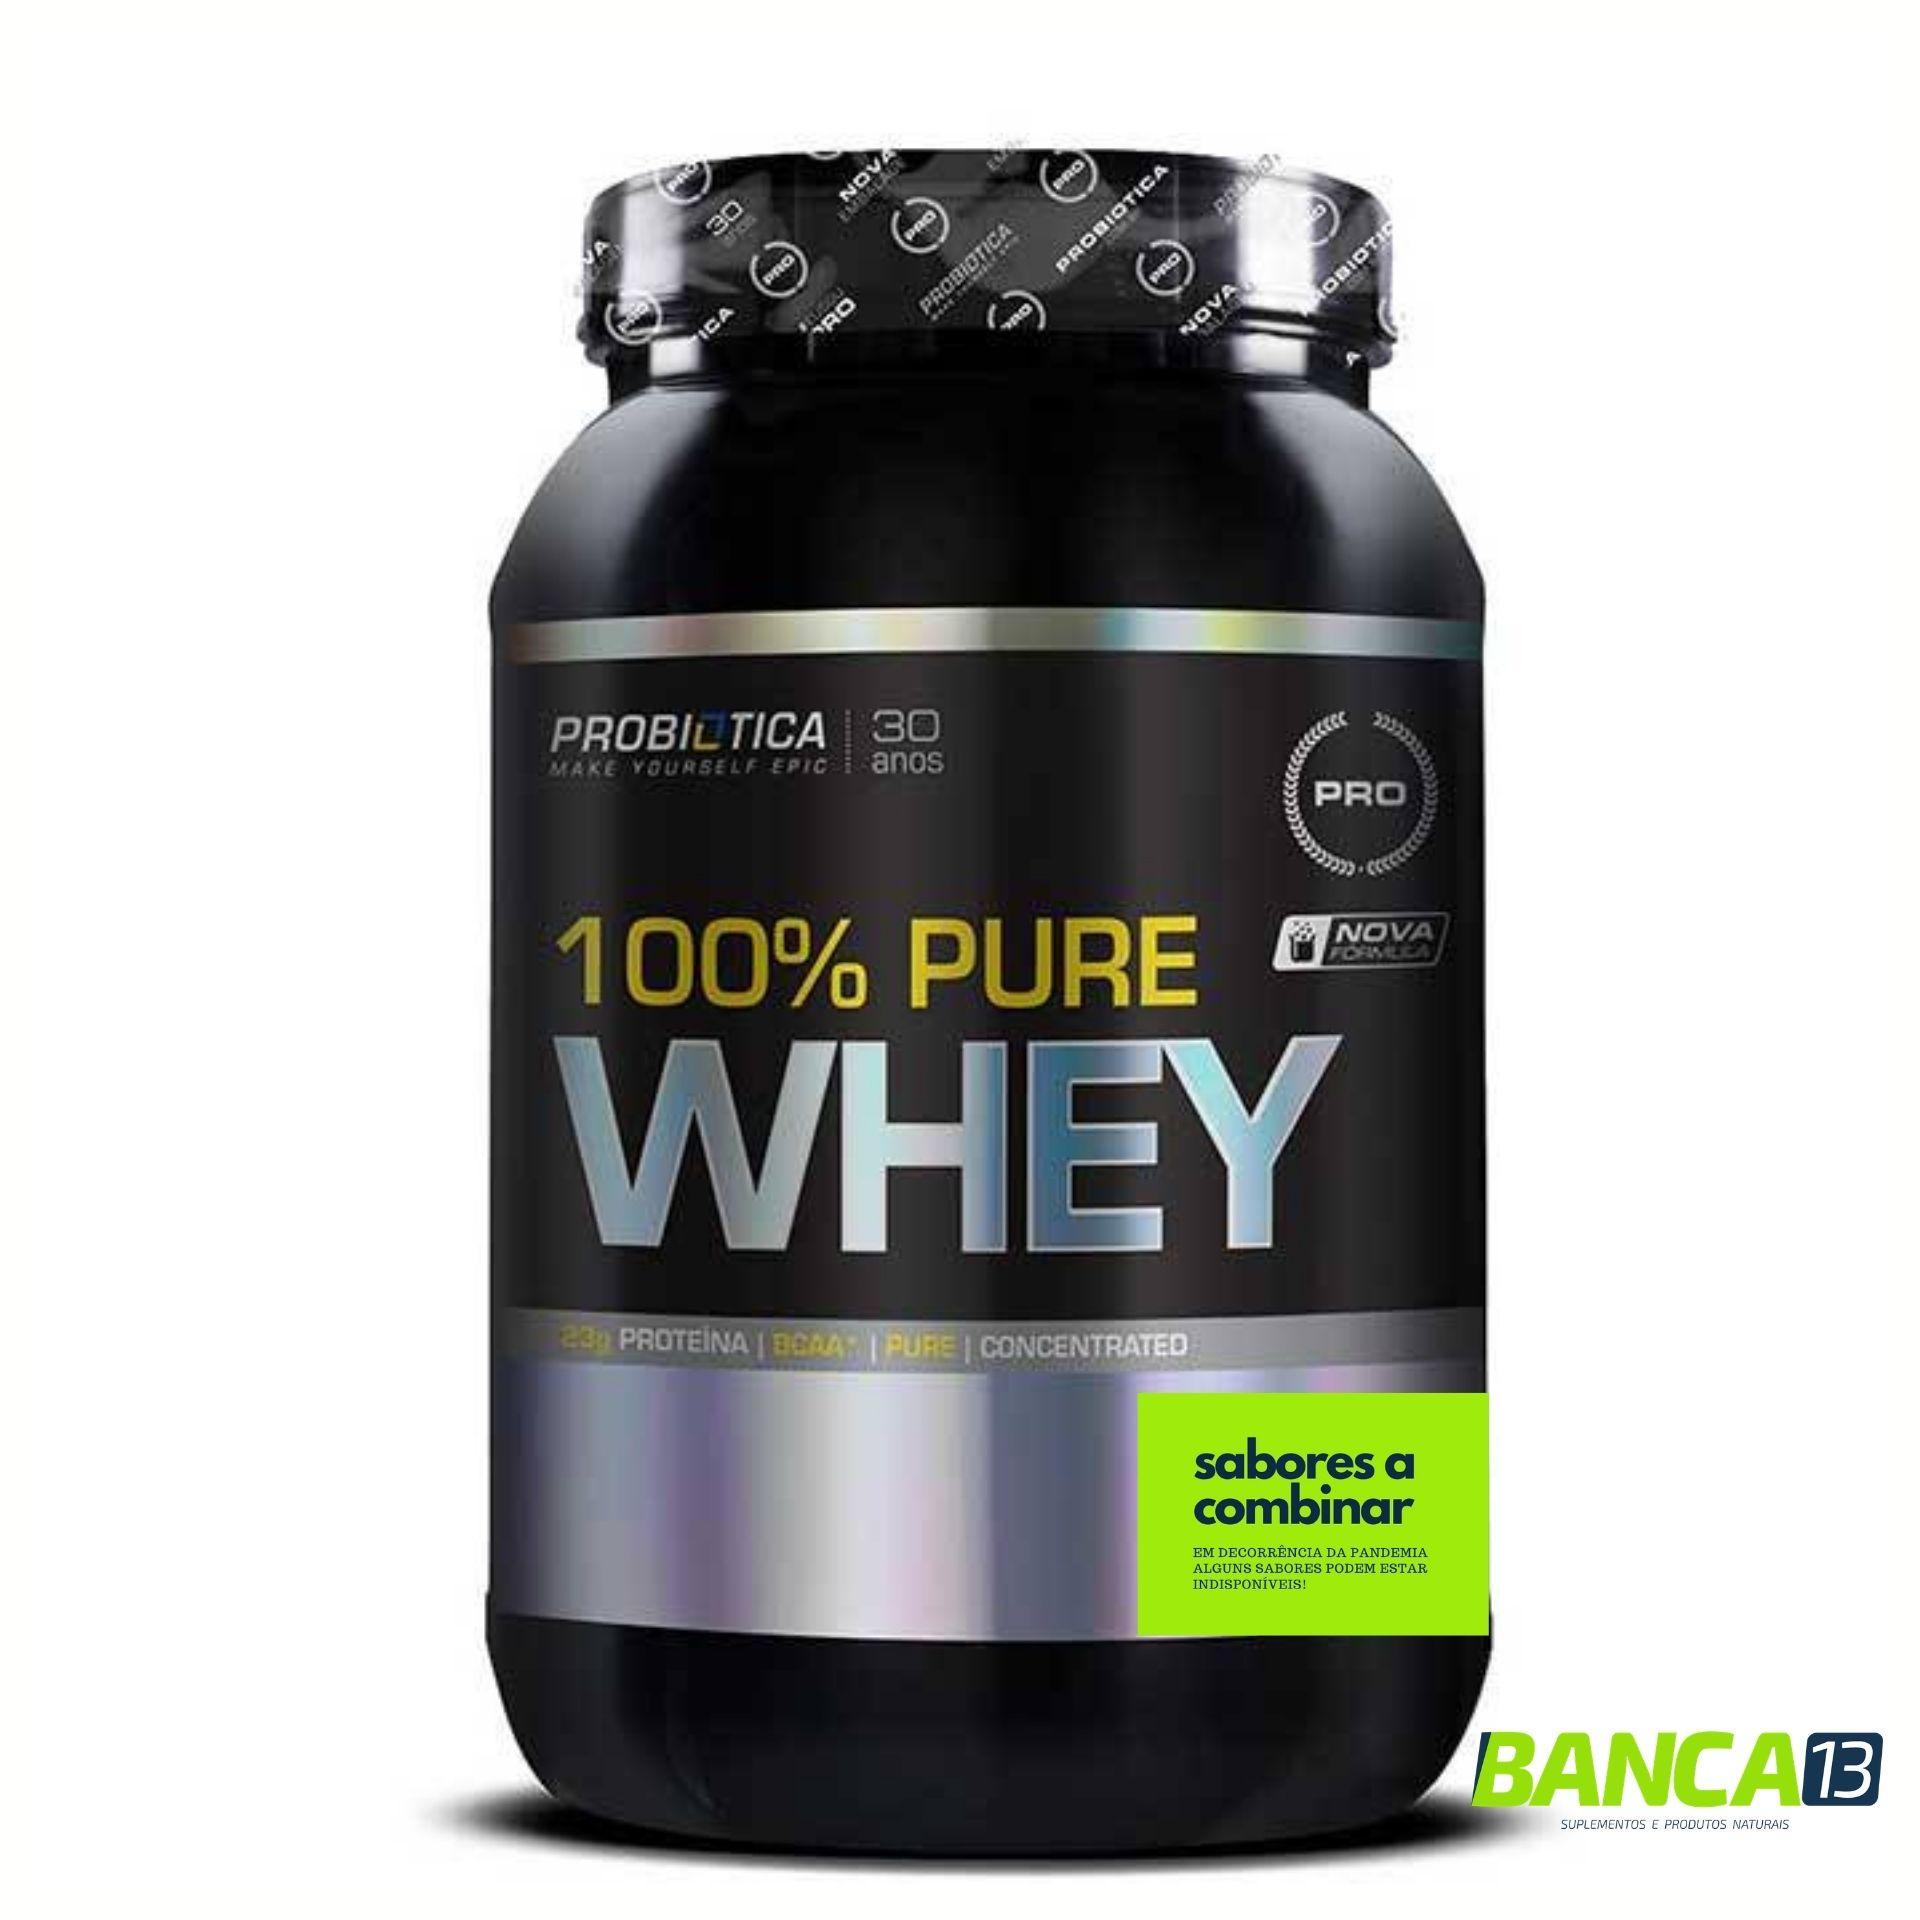 100% Pure Whey - Probiótica = SABOR A COMBINAR!